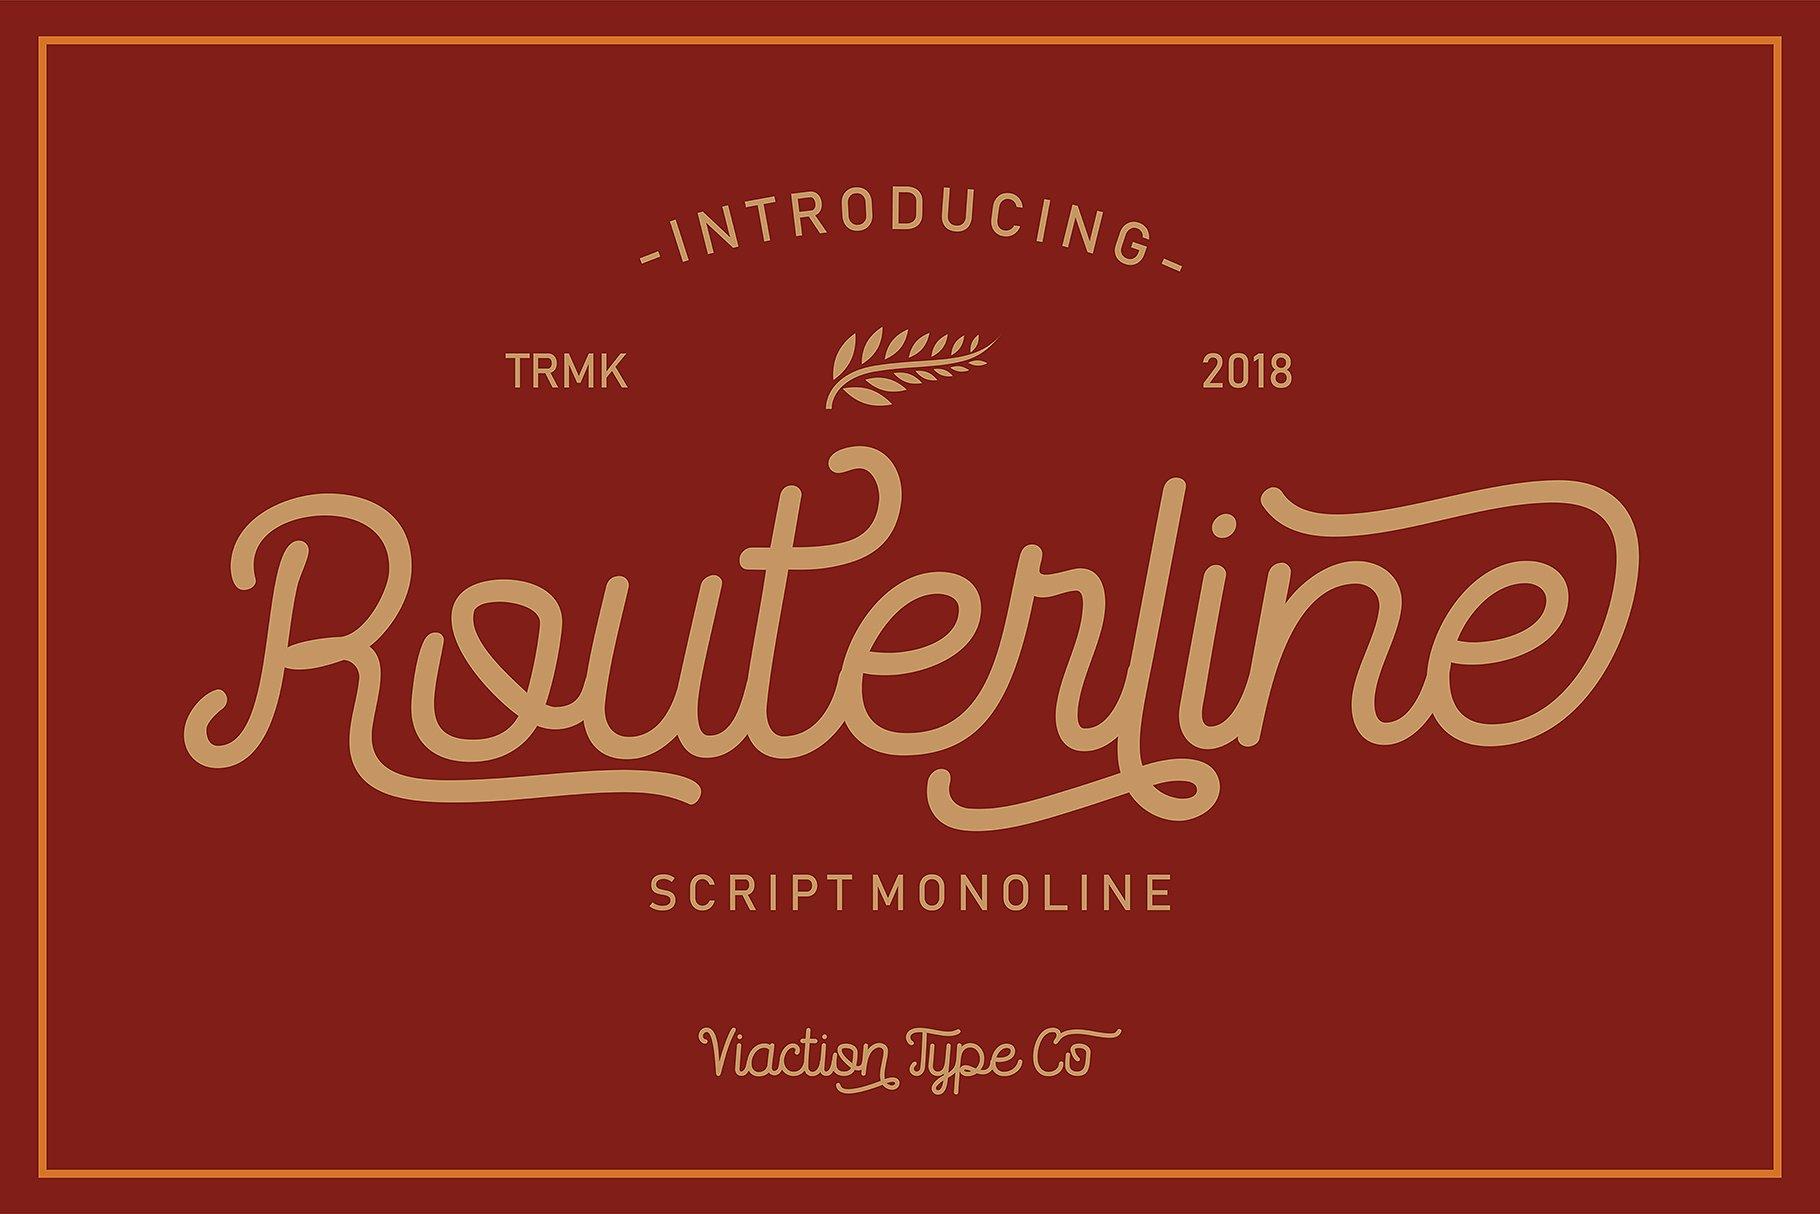 Routerline Typeface